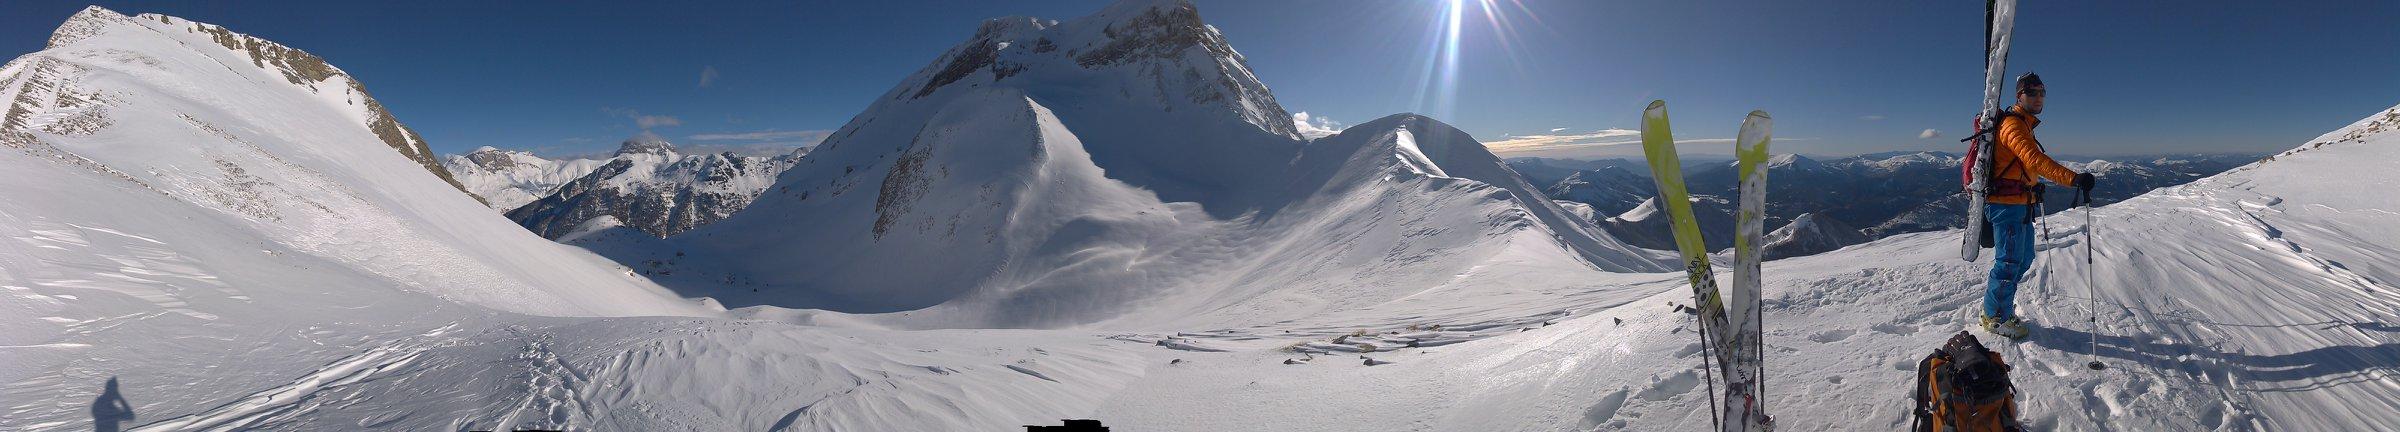 beau panorama du vallon de laverq en ubaye